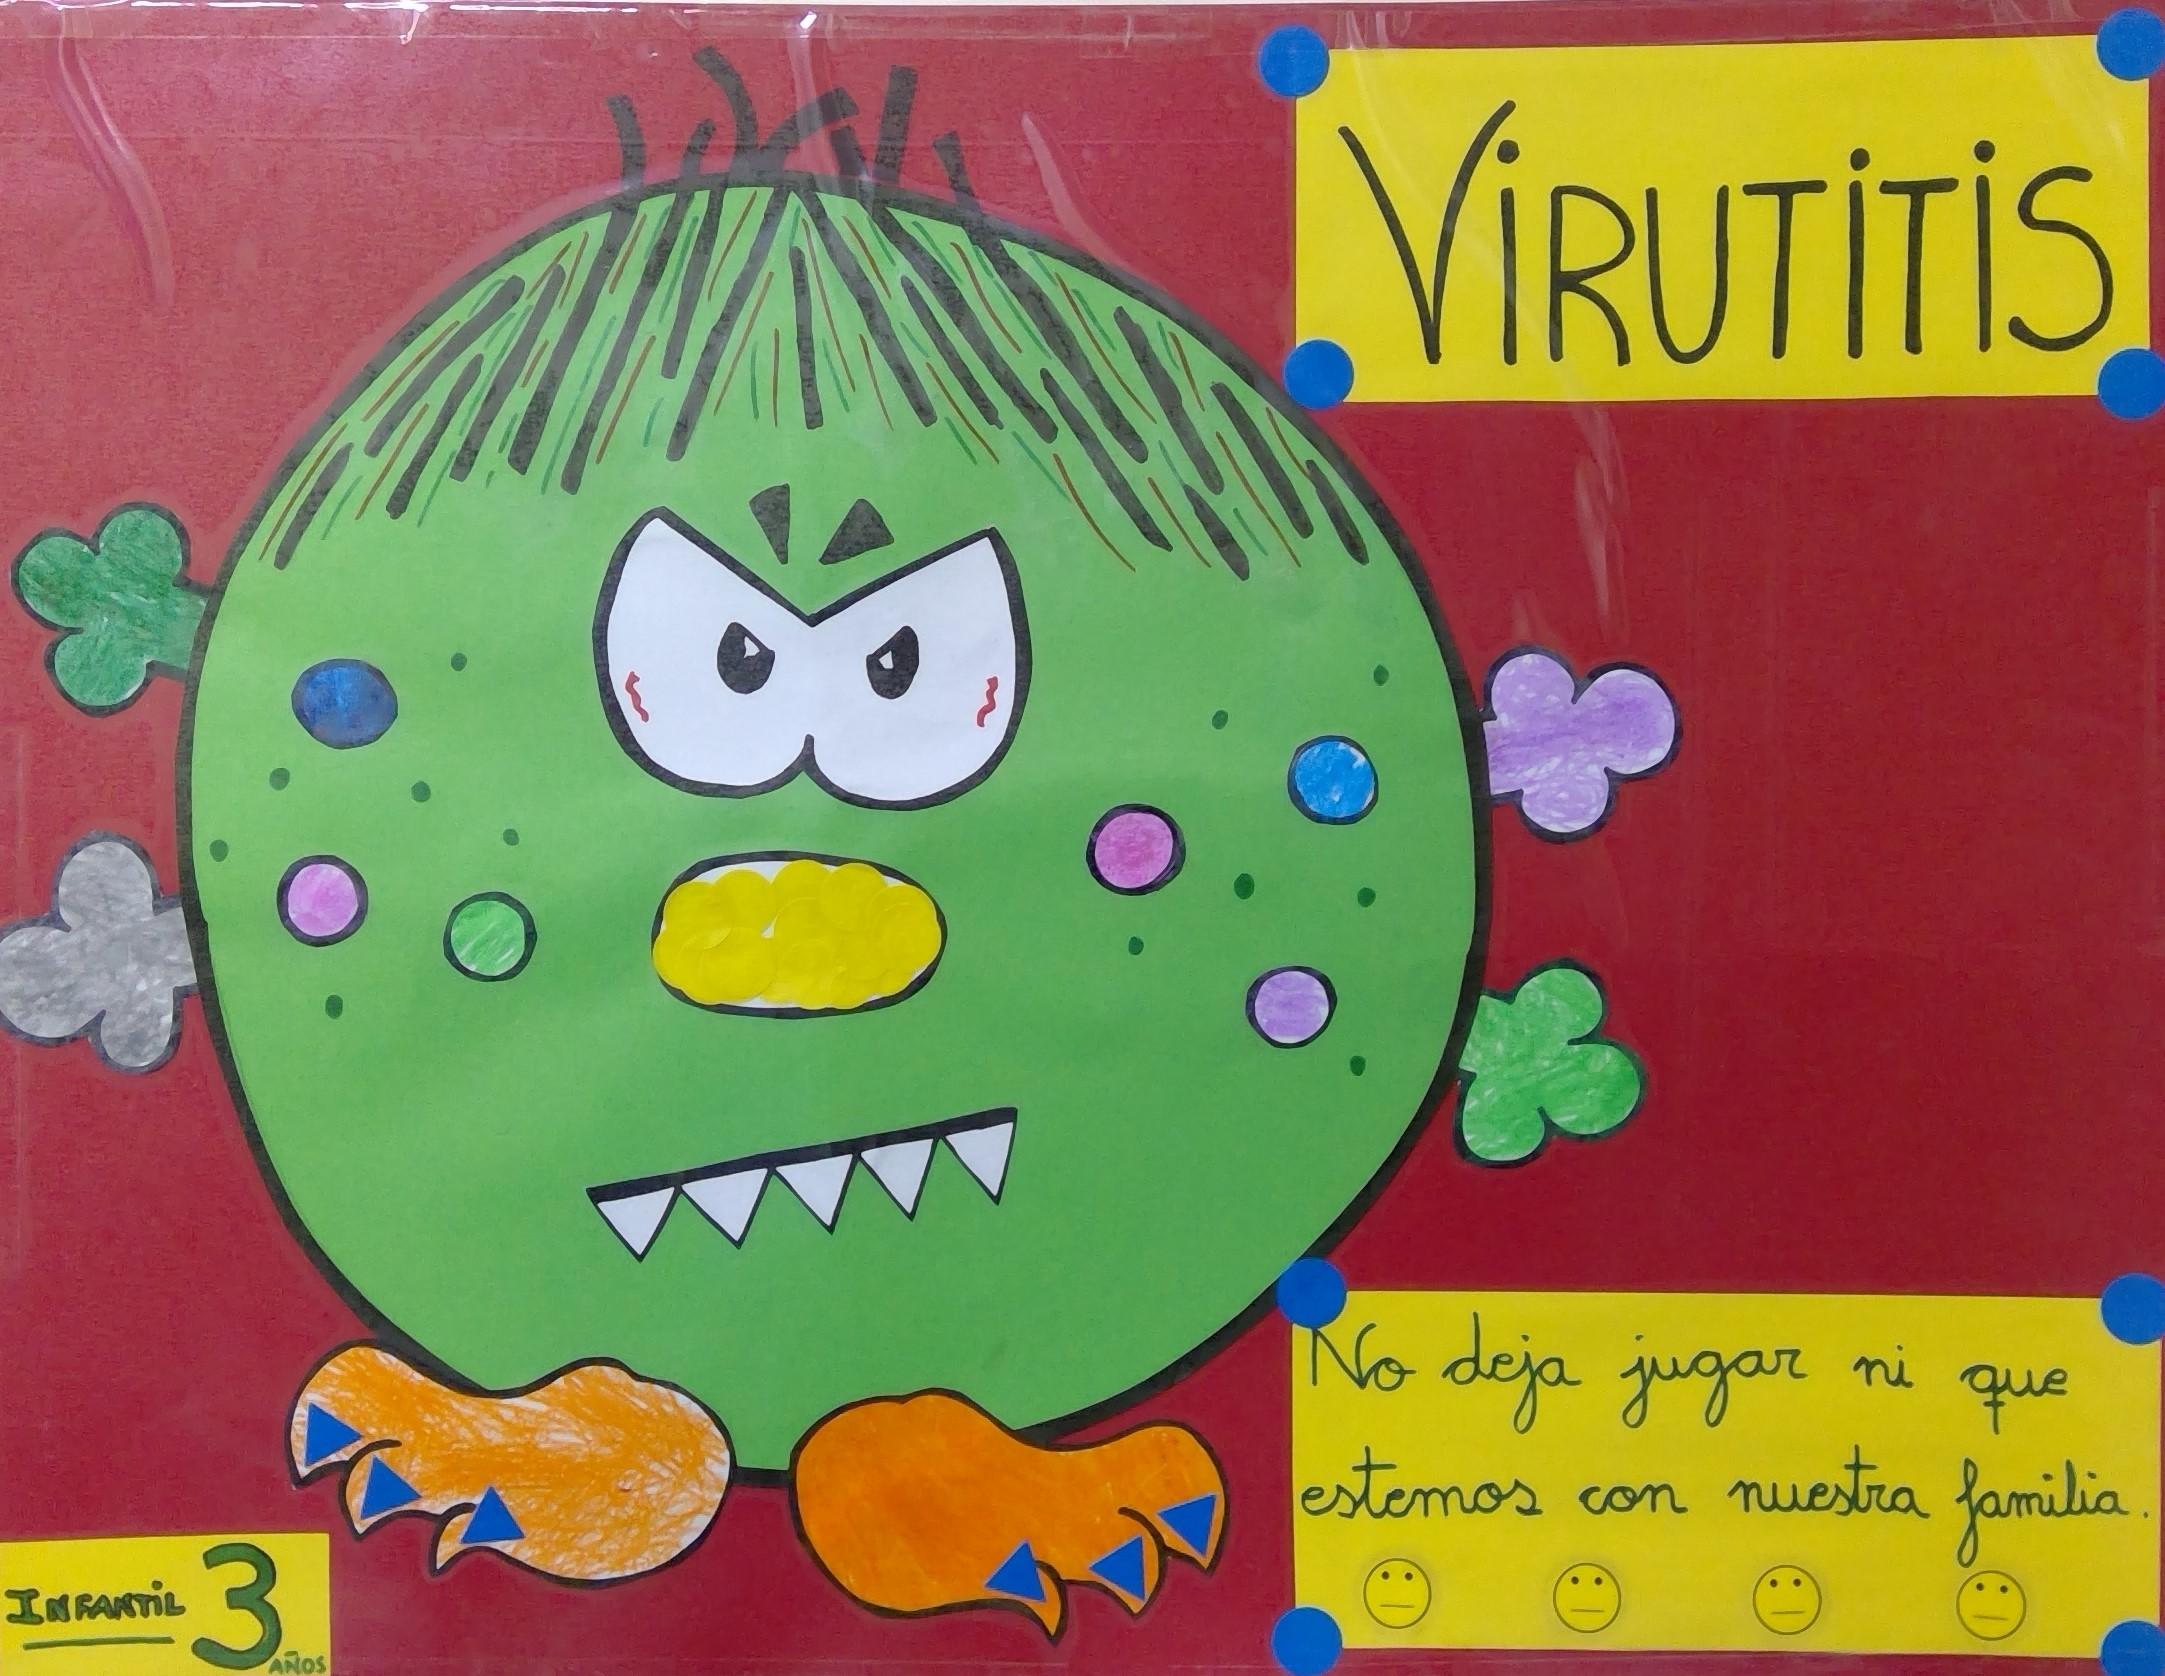 violentovirus 3